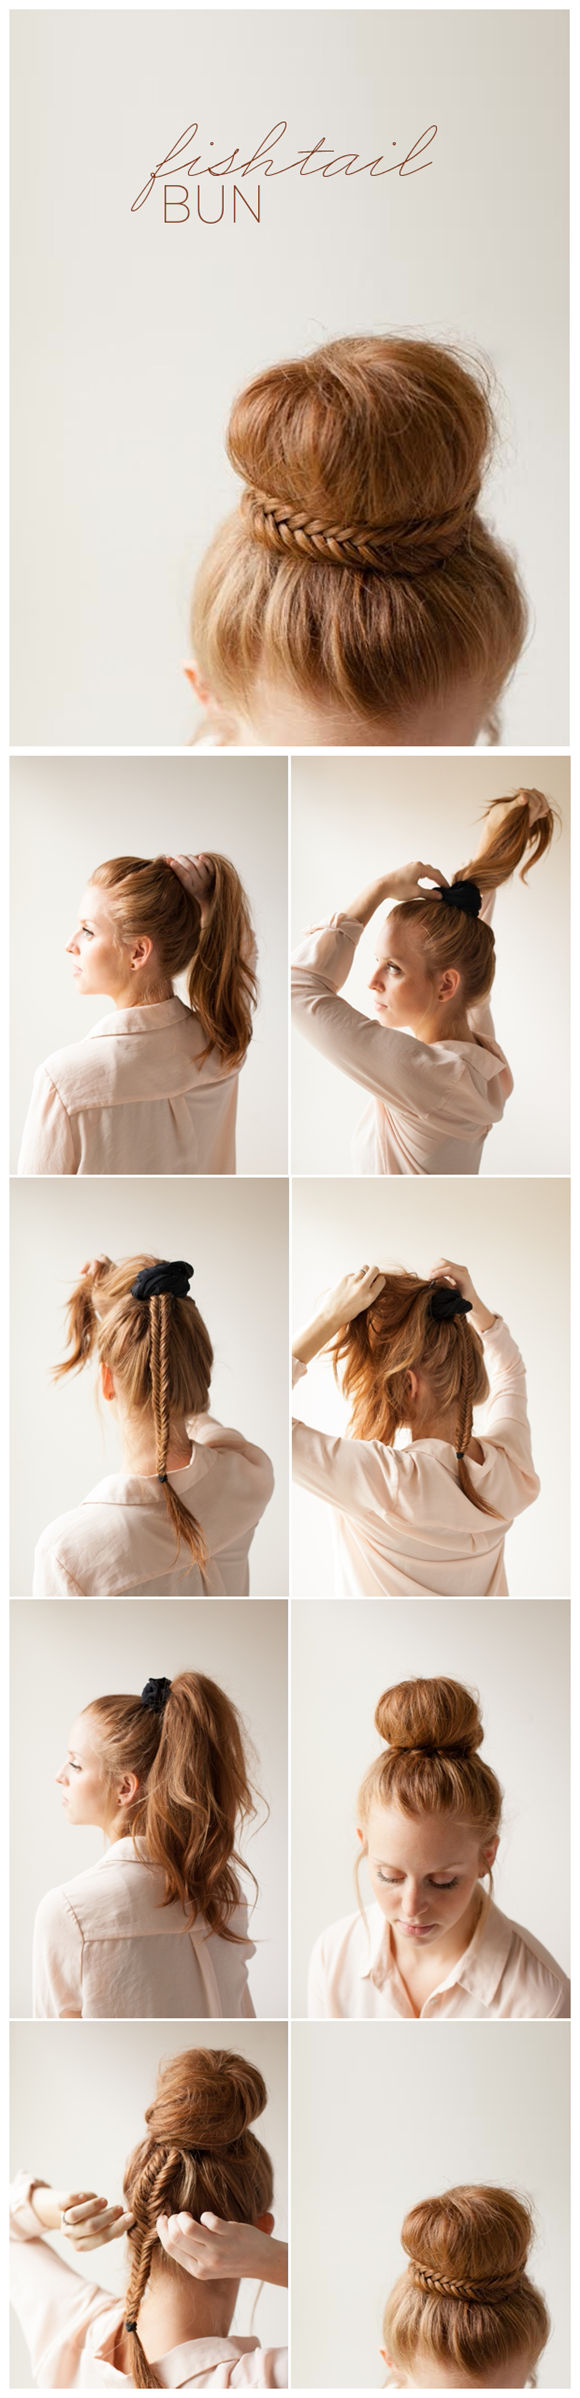 DIY Hairstyles: Braided Fishtail Bun Updo Tutorial